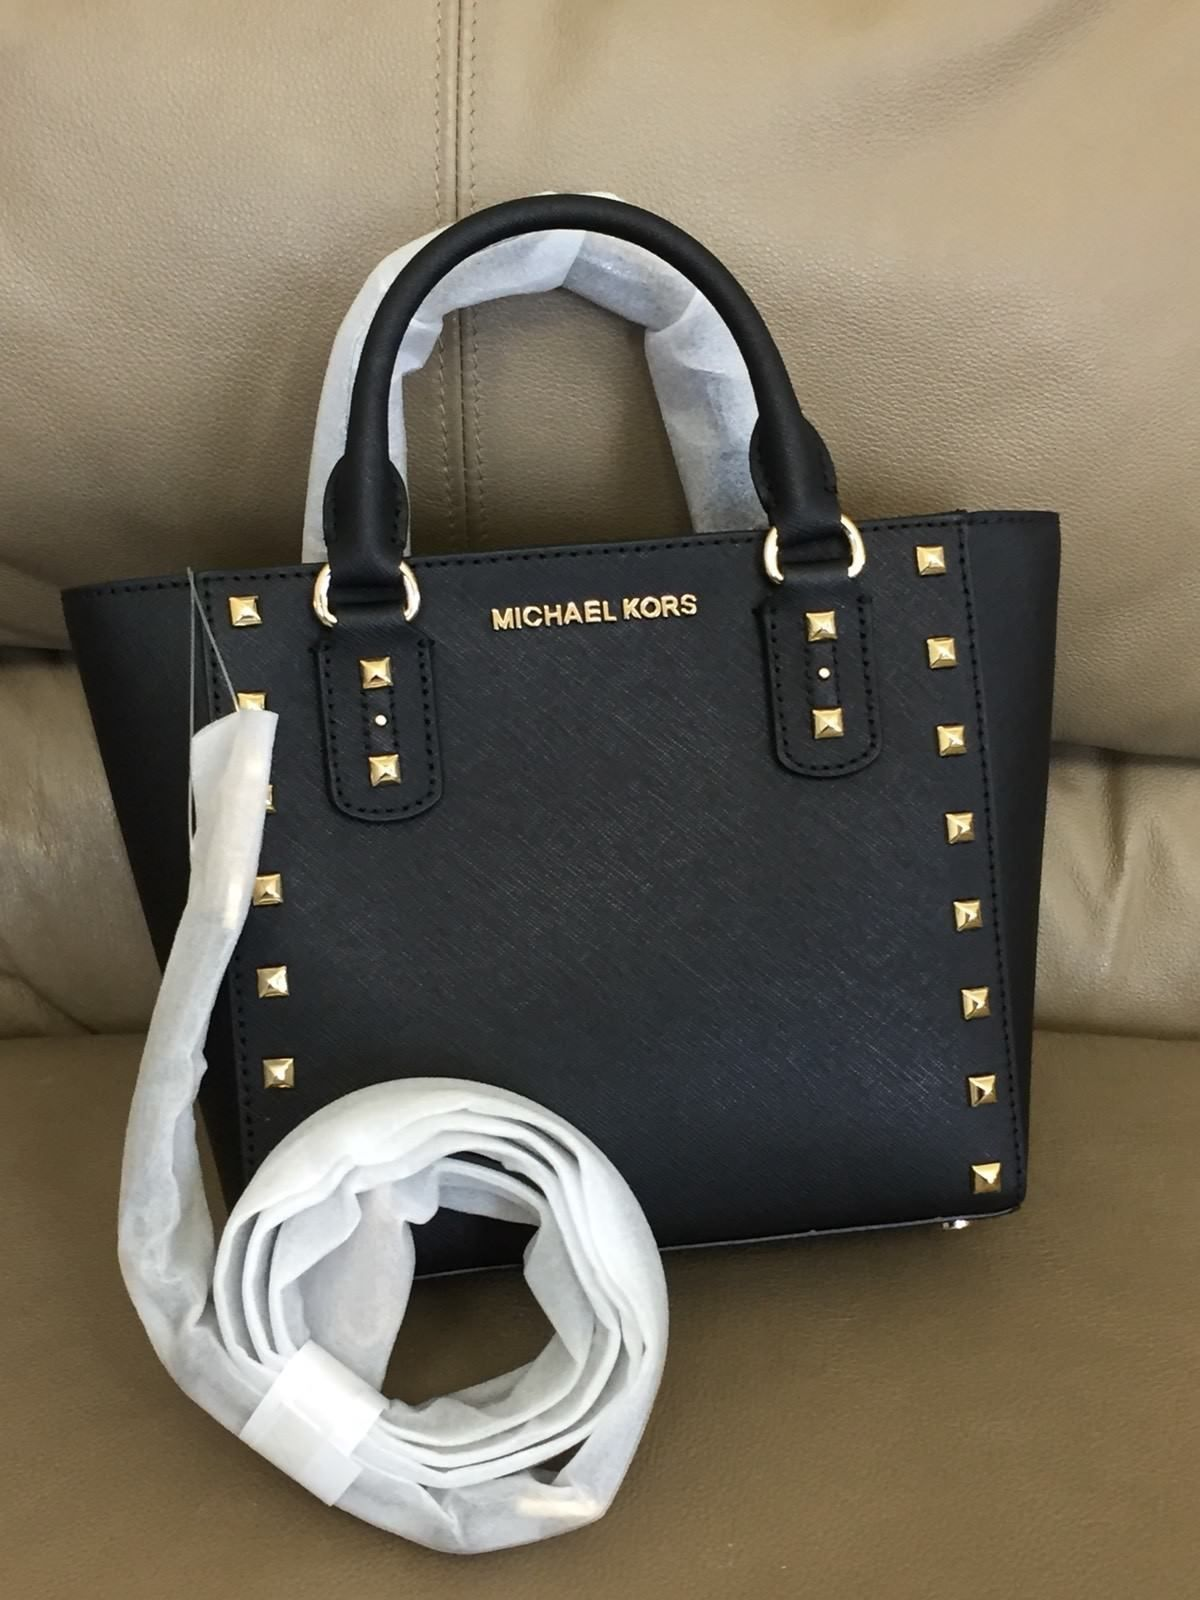 ed3b499b6d0b MICHAEL KORS SANDRINE STUD Small Crossbody Satchel Bag BLACK Saffiano  Leather